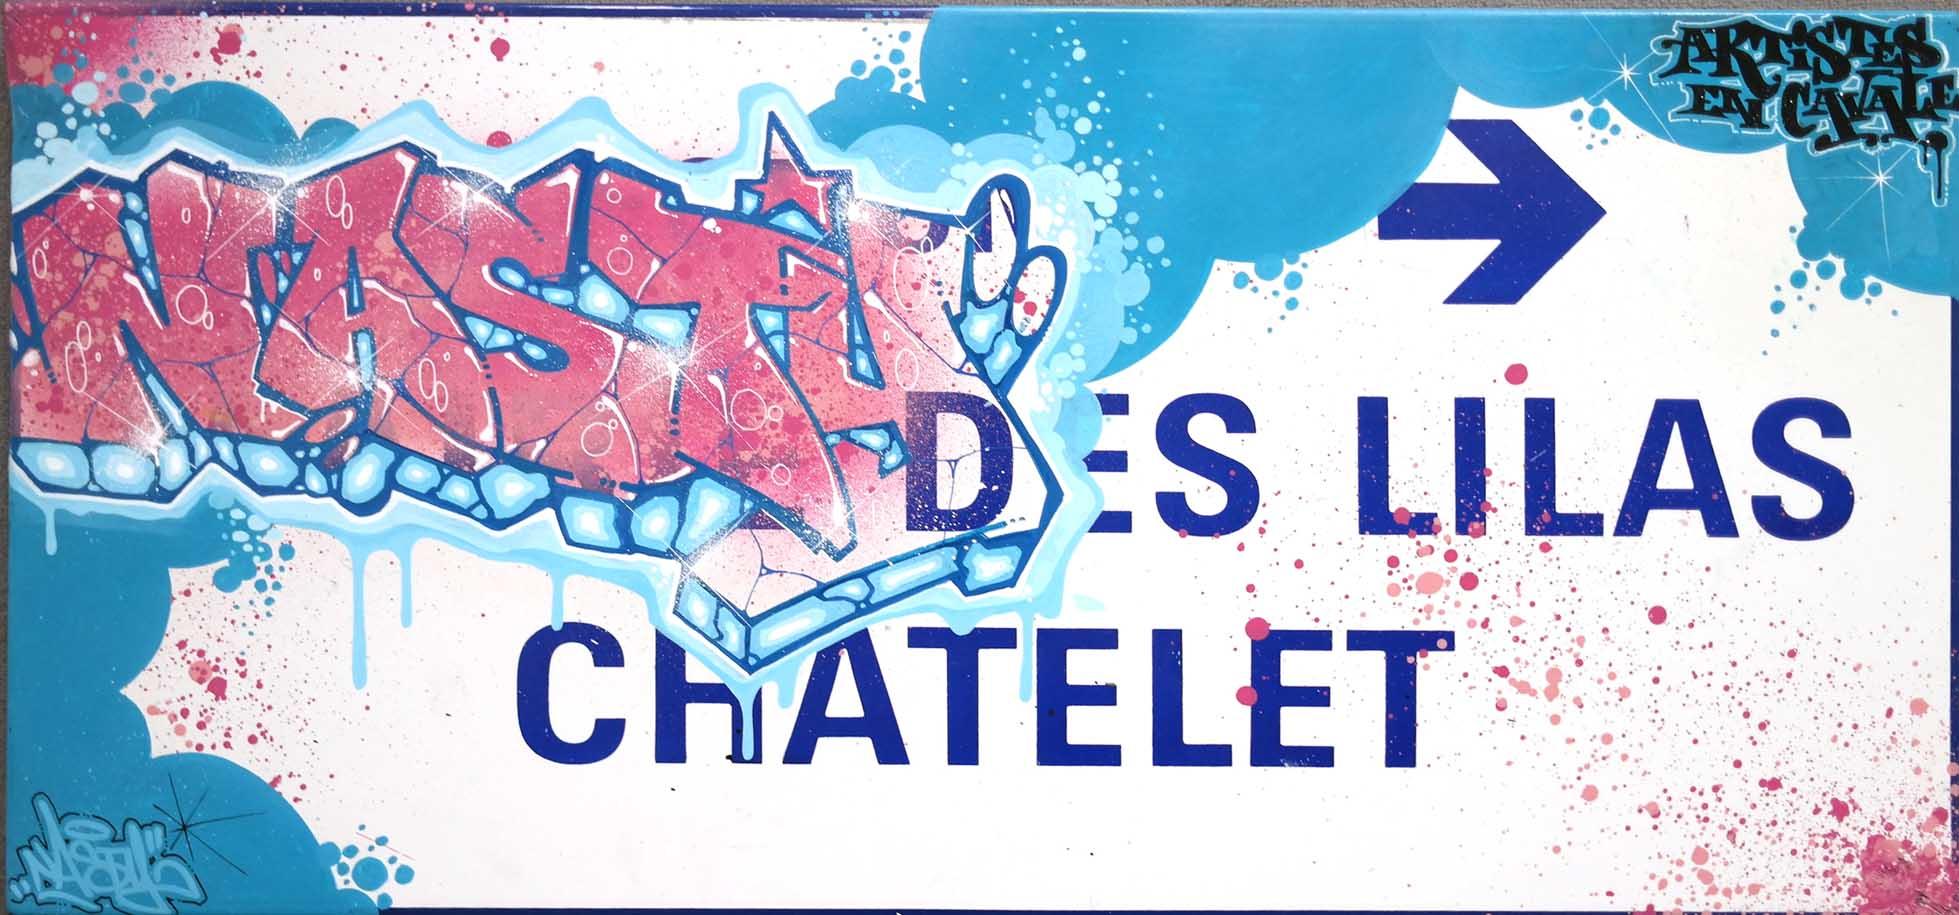 Nasty fresque chatelet